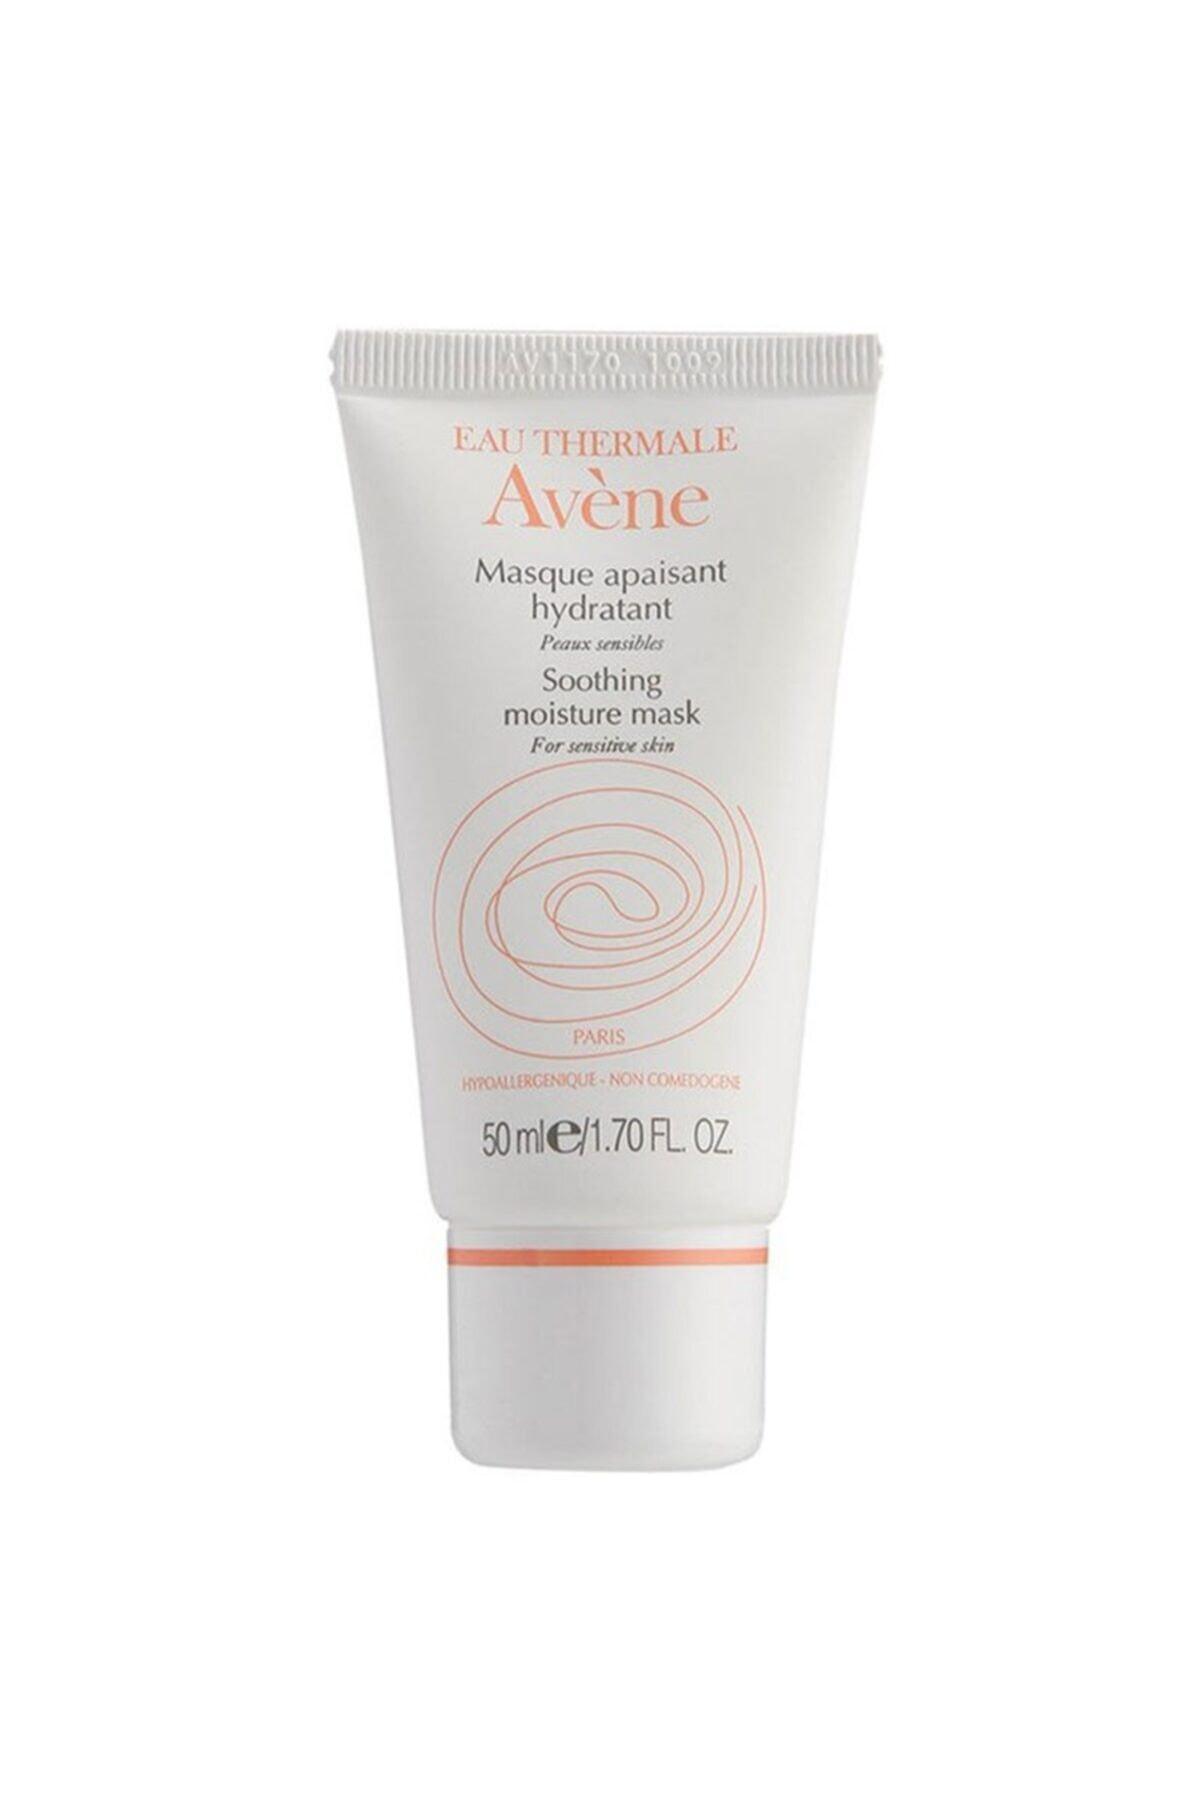 Avene Masque Apaisant Hydratant Nemlendirici Maske 50 ml 1